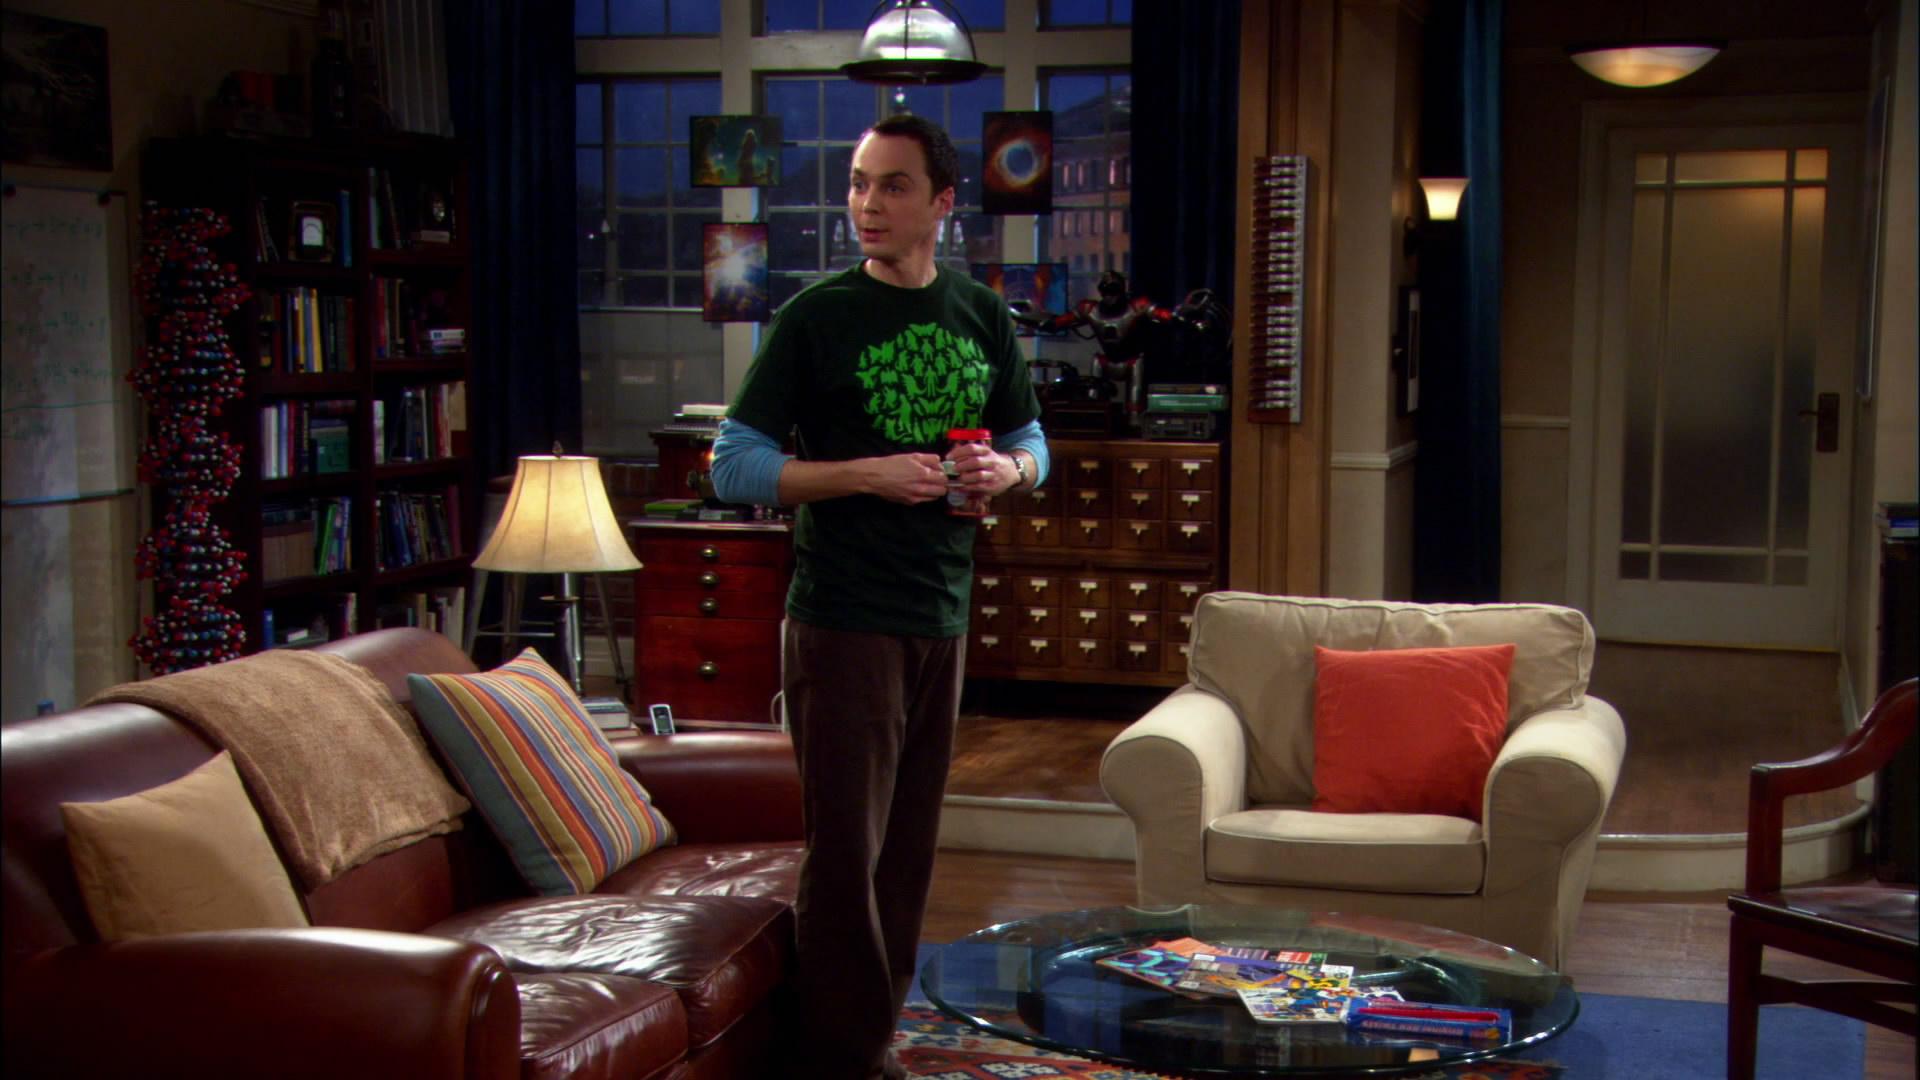 The.Big.Bang.Theory.S02E14.1080p.BluRay.x264-CiNEFiLE.mkv_snapshot_05.45_[2014.12.08_22.07.26].jpg